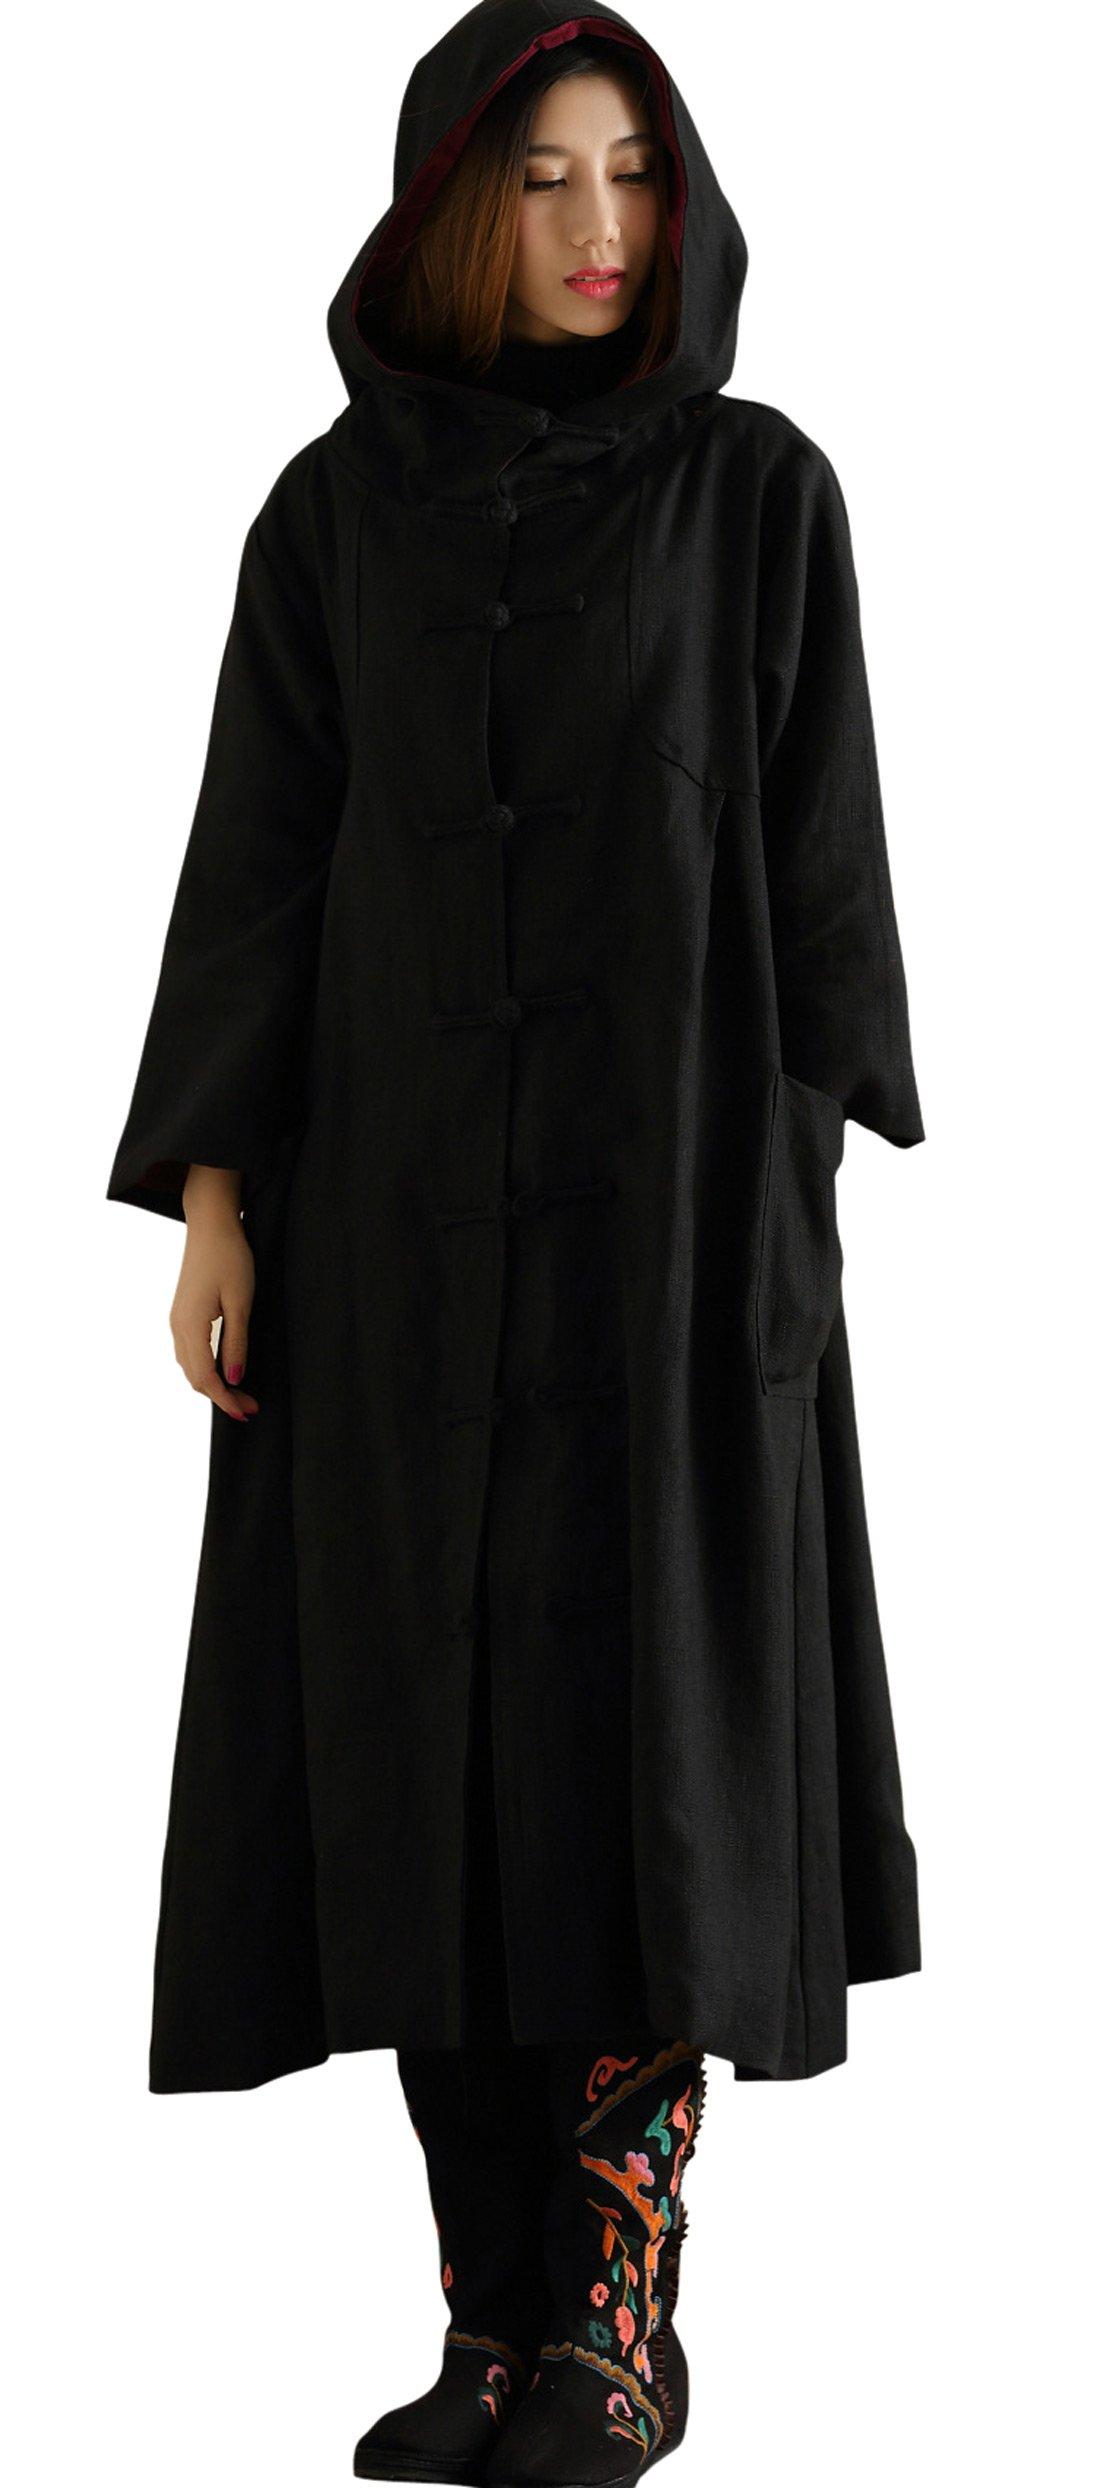 Chouyatou Women's Retro Cotton-Linen Long Hooded Cloaks Coat Costume (One Size, Black)